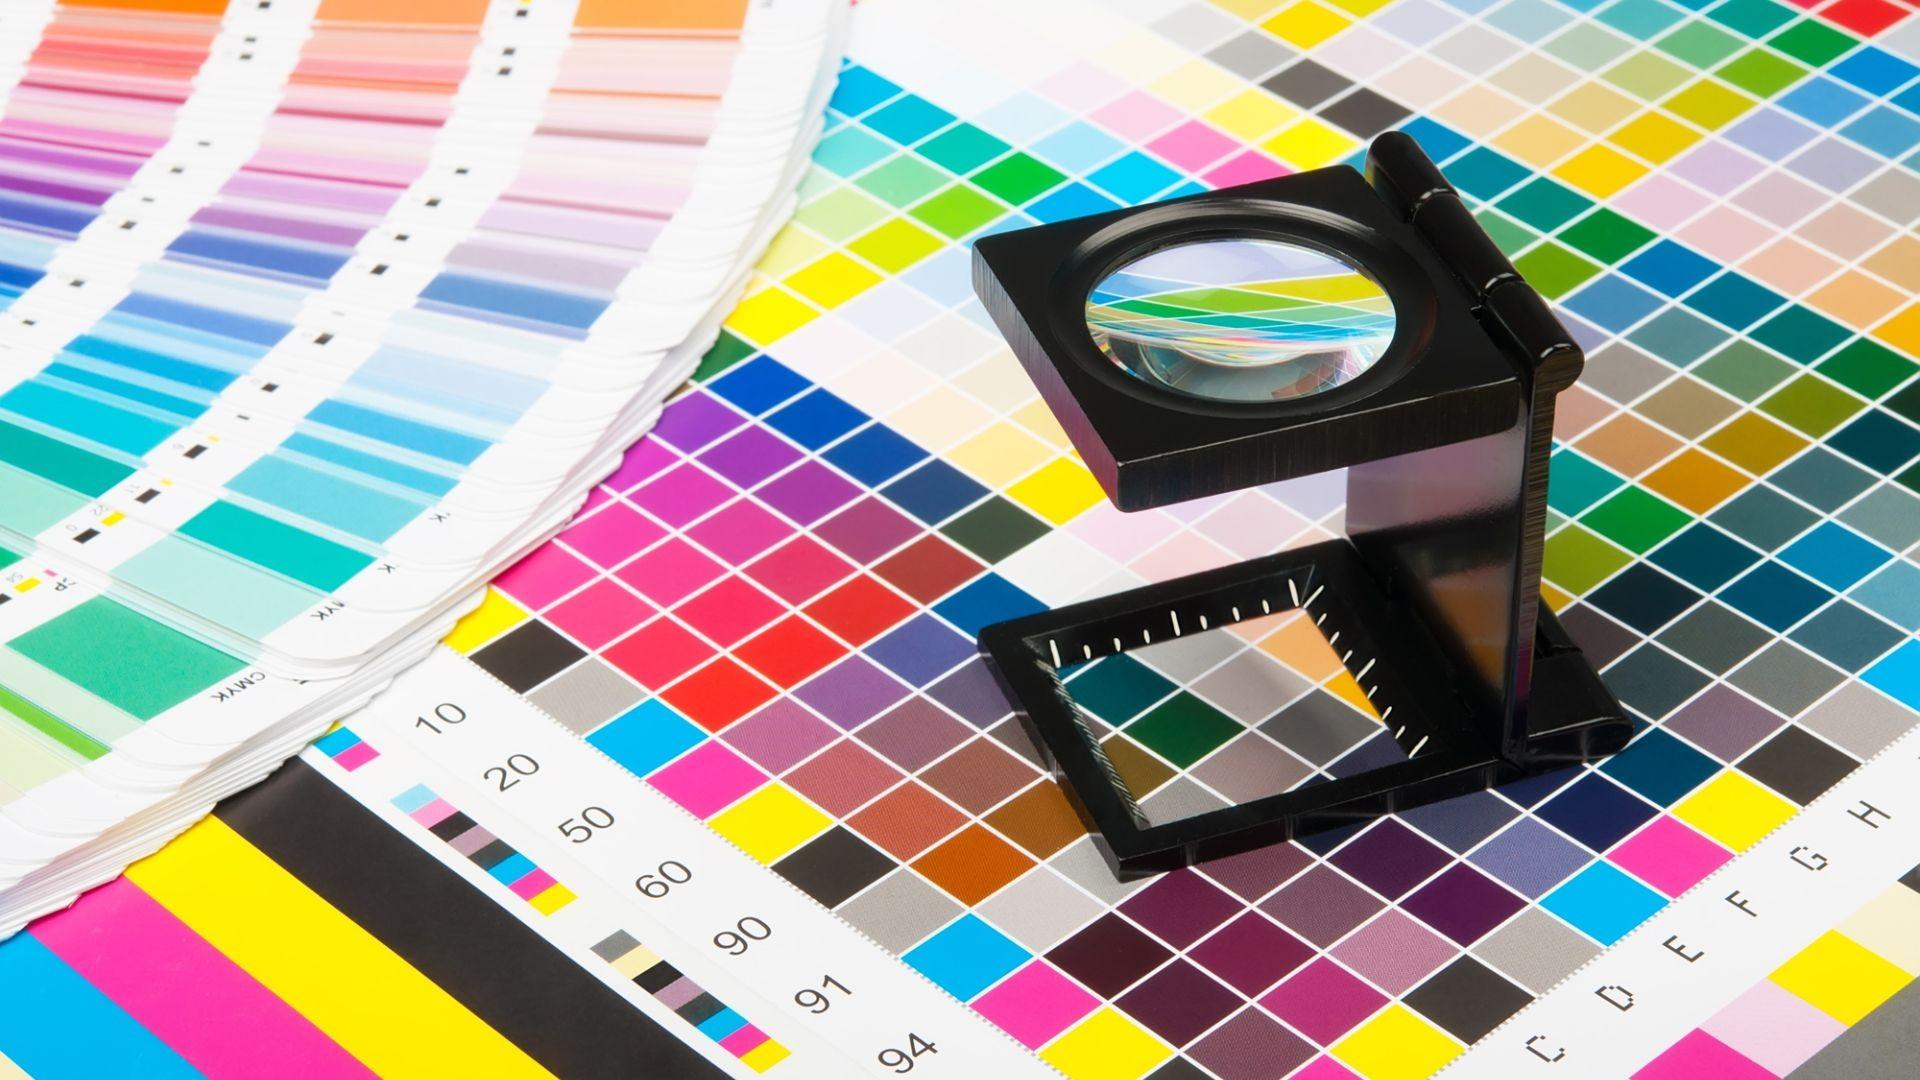 000 diseño gráfico artes gráficas imprenta  (1)